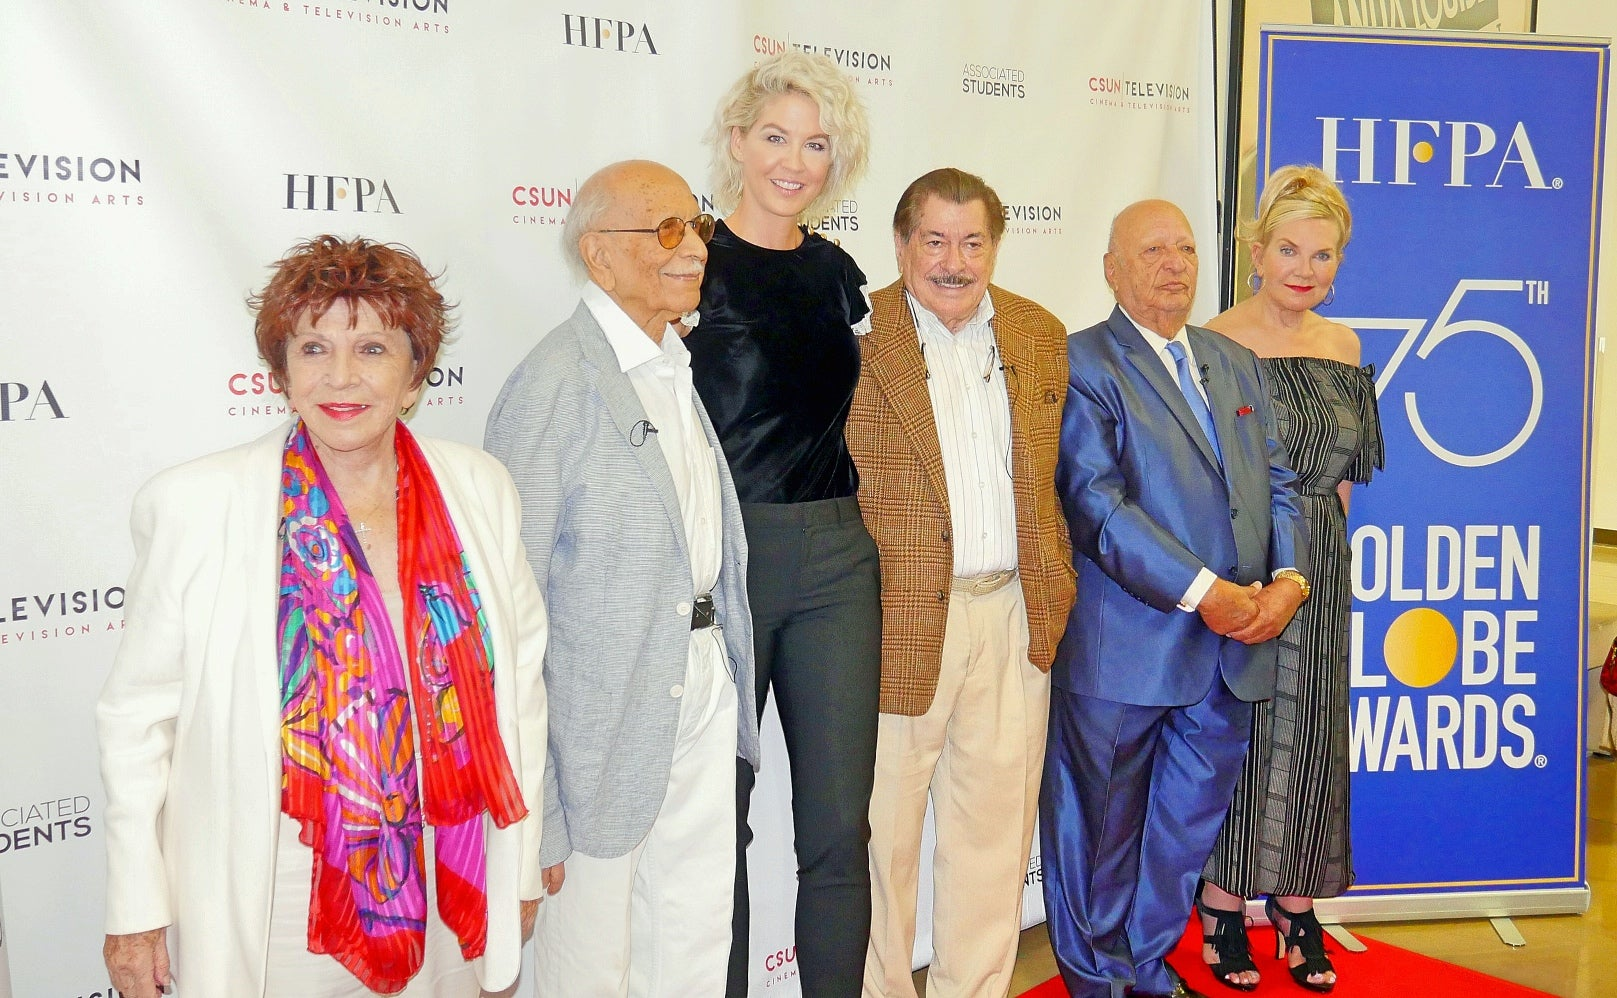 Senior members of the HFPA and Jenna Elfman at CSUN